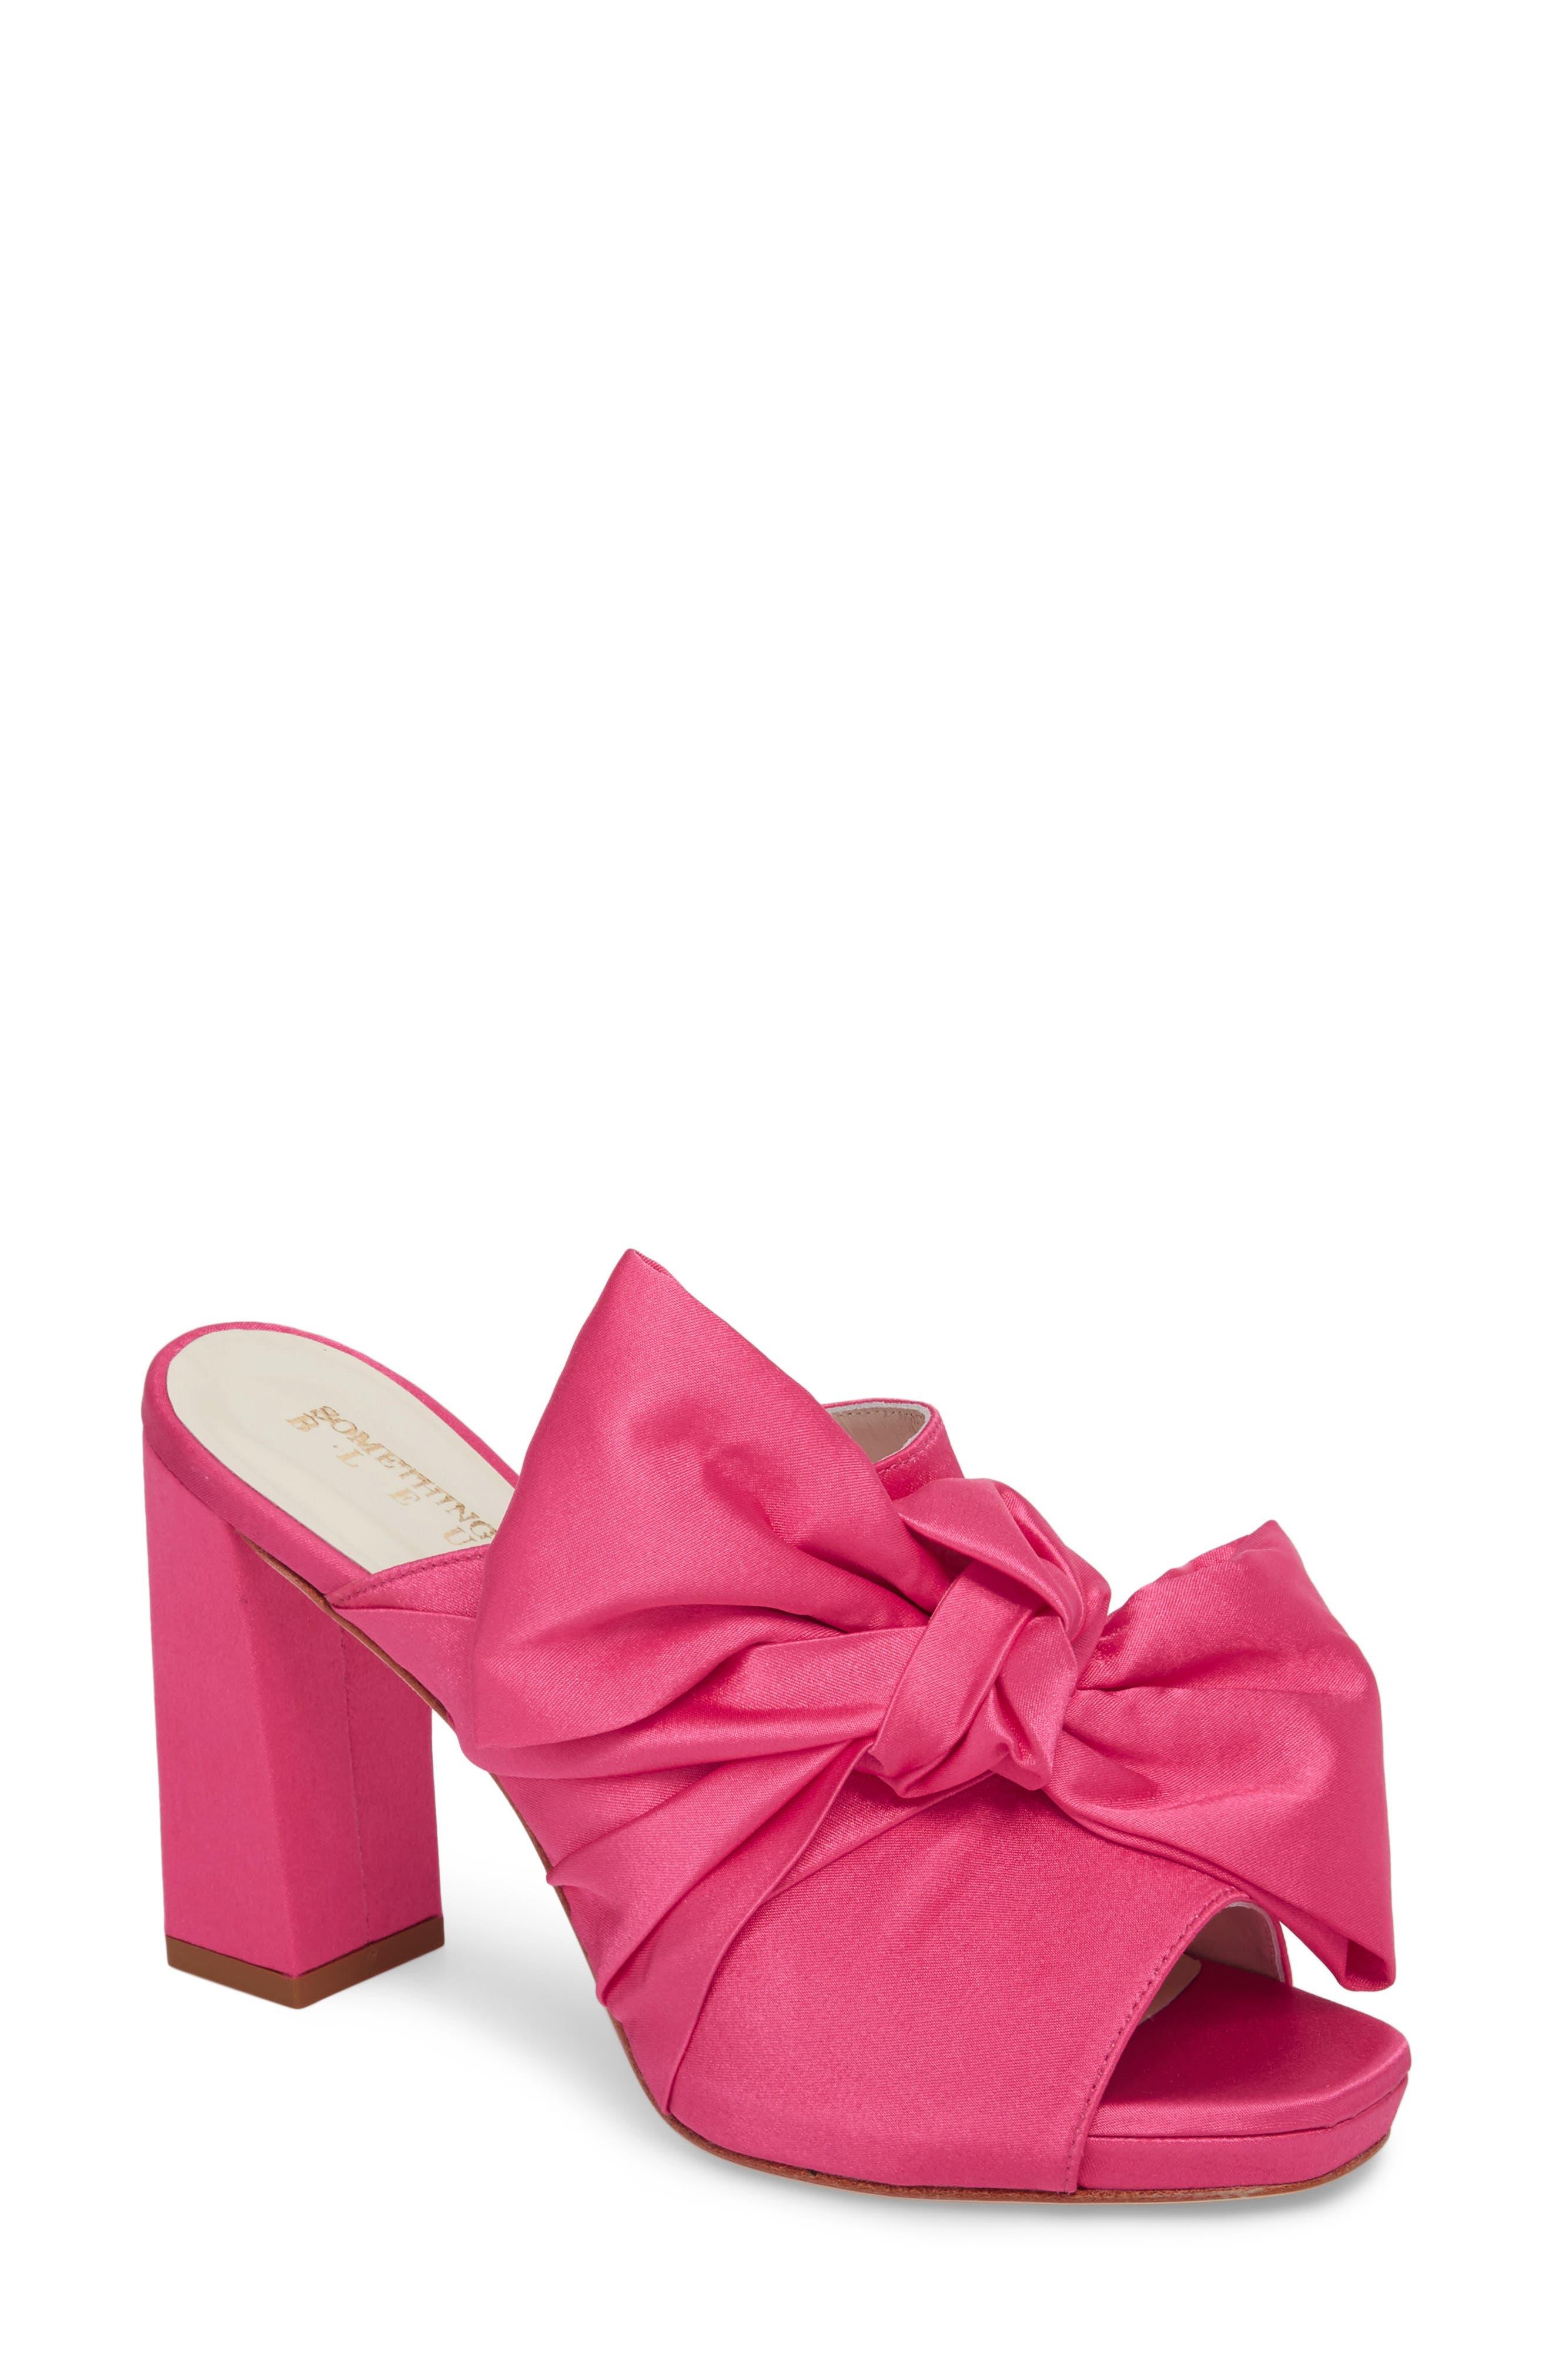 Elisa Knotted Bow Mule,                             Main thumbnail 1, color,                             Hot Pink Satin